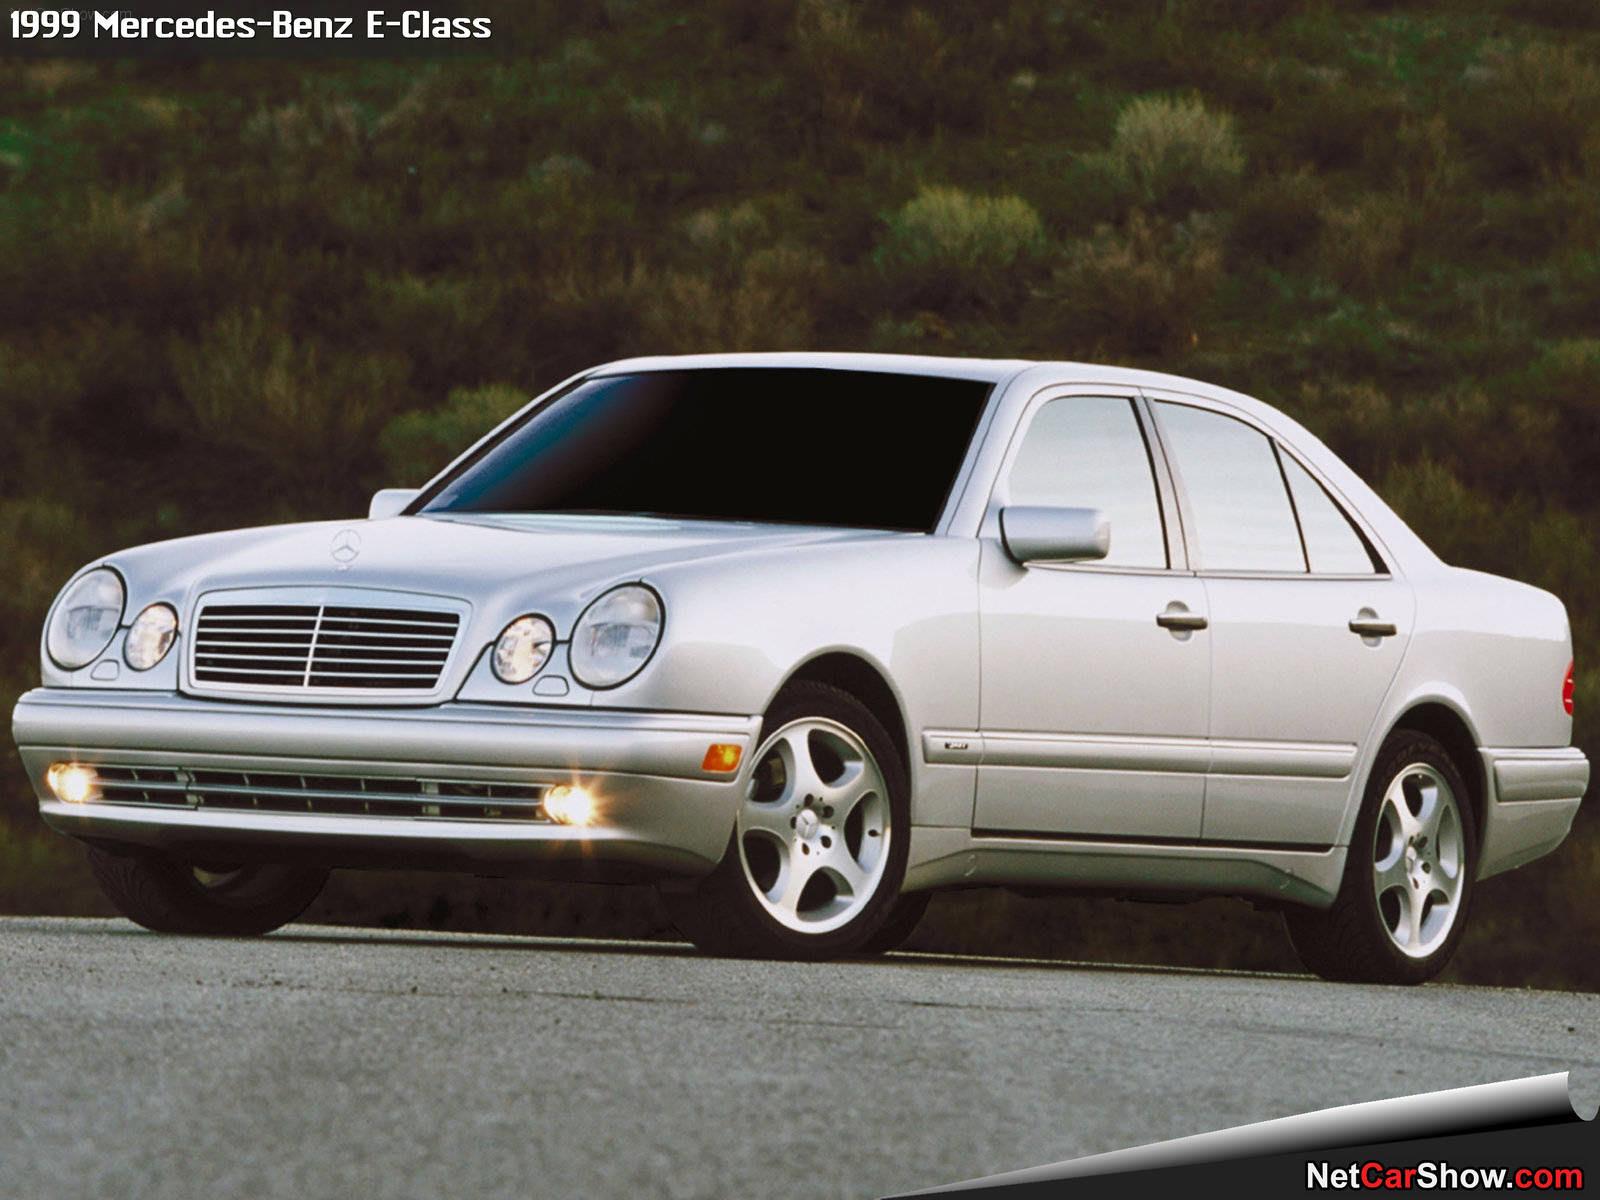 Mercedes-Benz E-Class (1999) picture #04, 1024x768